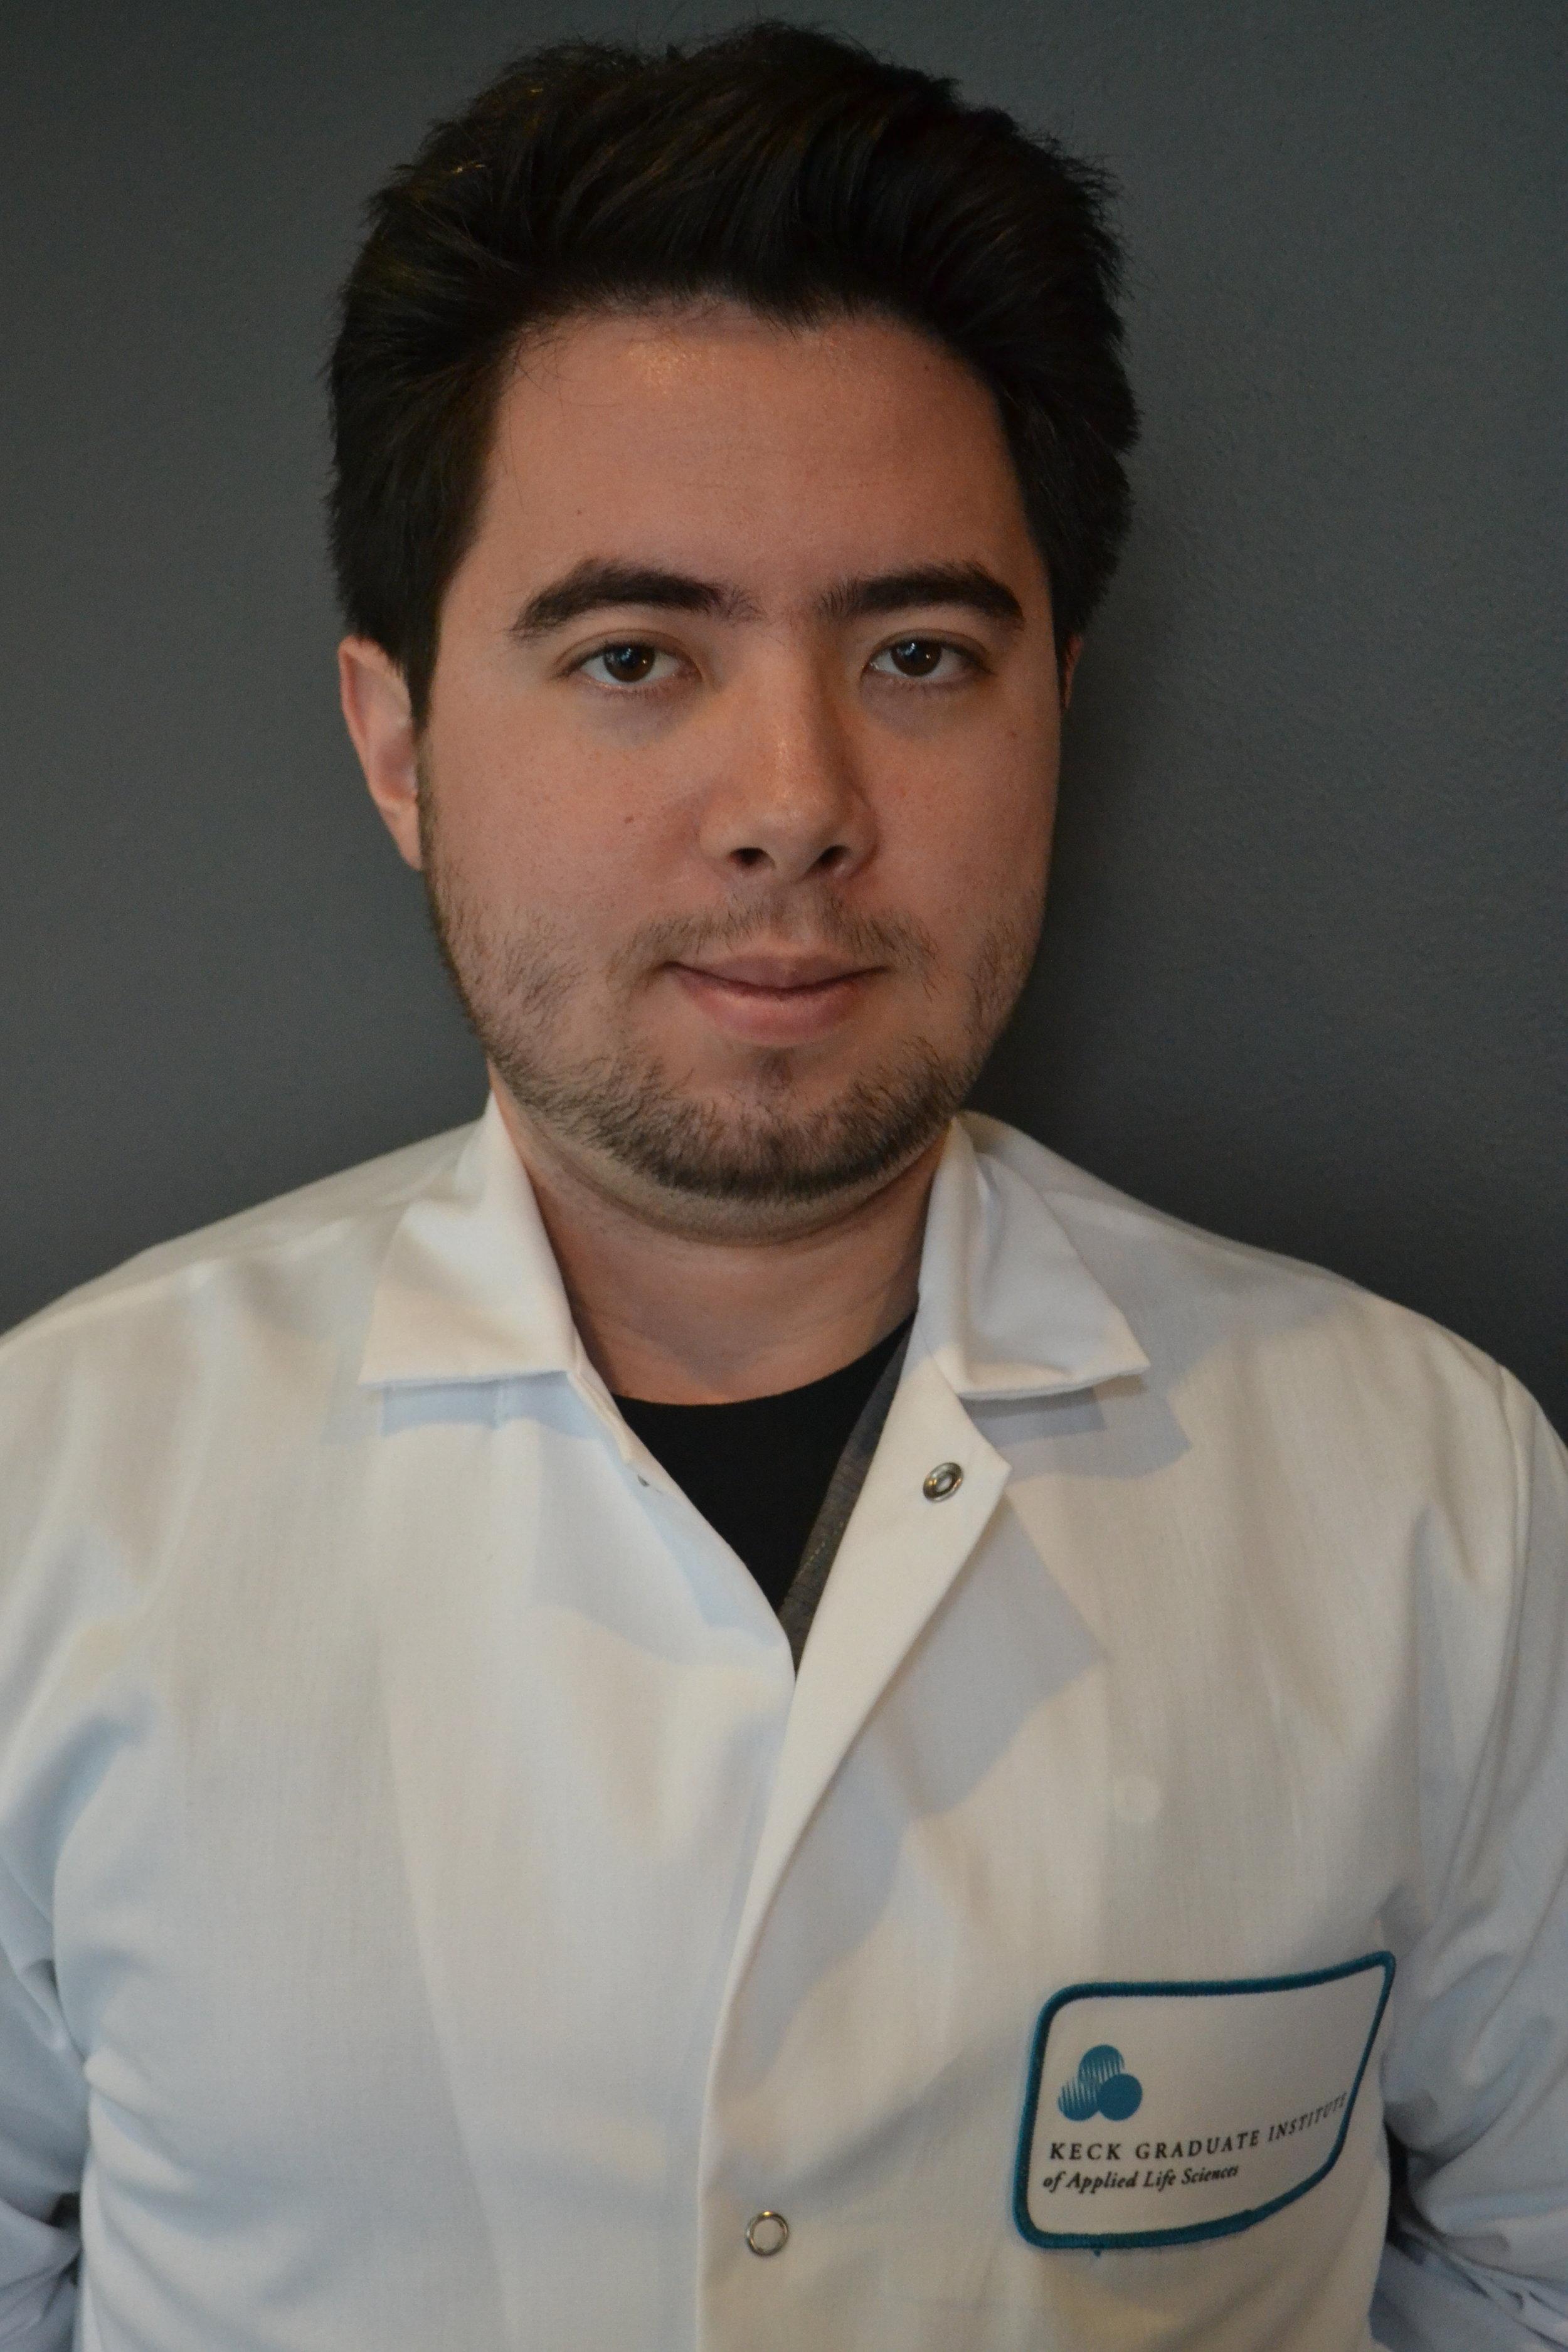 Joshua Littig - Master of Science in Clinical Research CandidateB.A. Neuroscience | University of California, RiversideLinkedIn